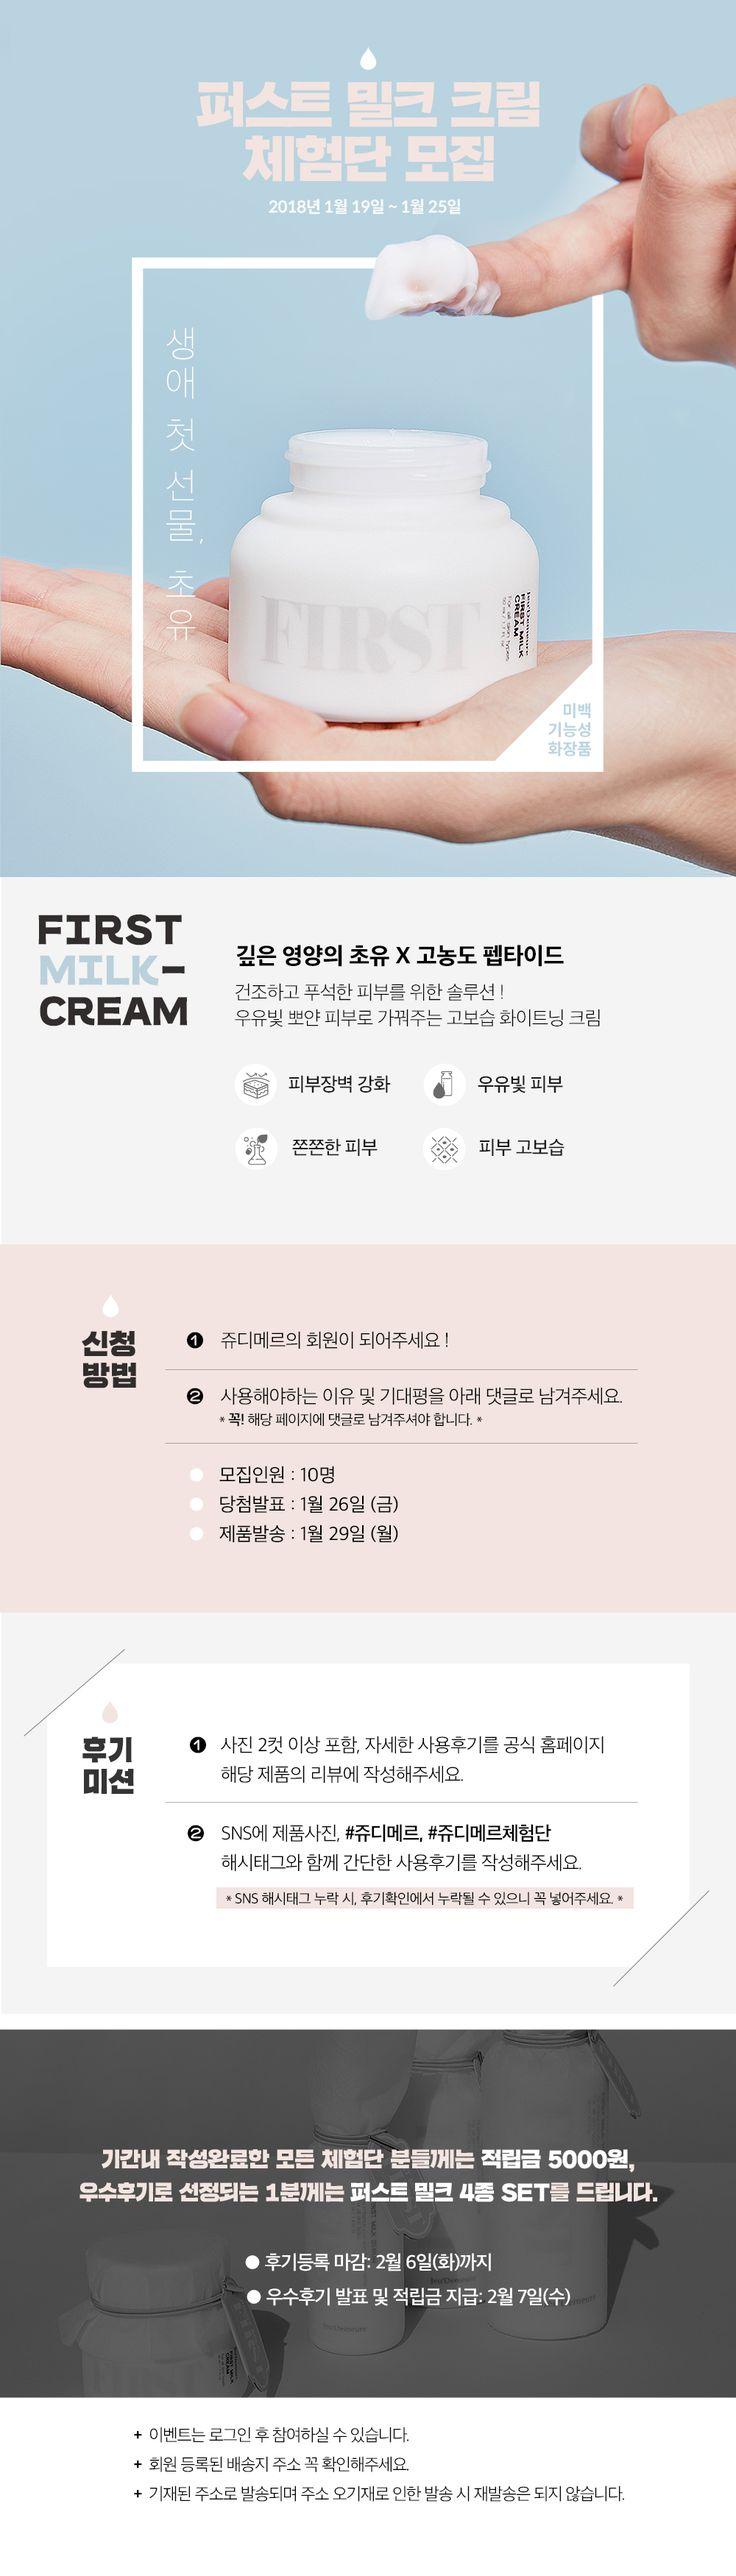 [jeu'demeure] web design detail information webpage layout cosmetic skincare brand cream event  쥬디메르 화장품 크림 이벤트 페이지 웹 디자인 @chloe__seul